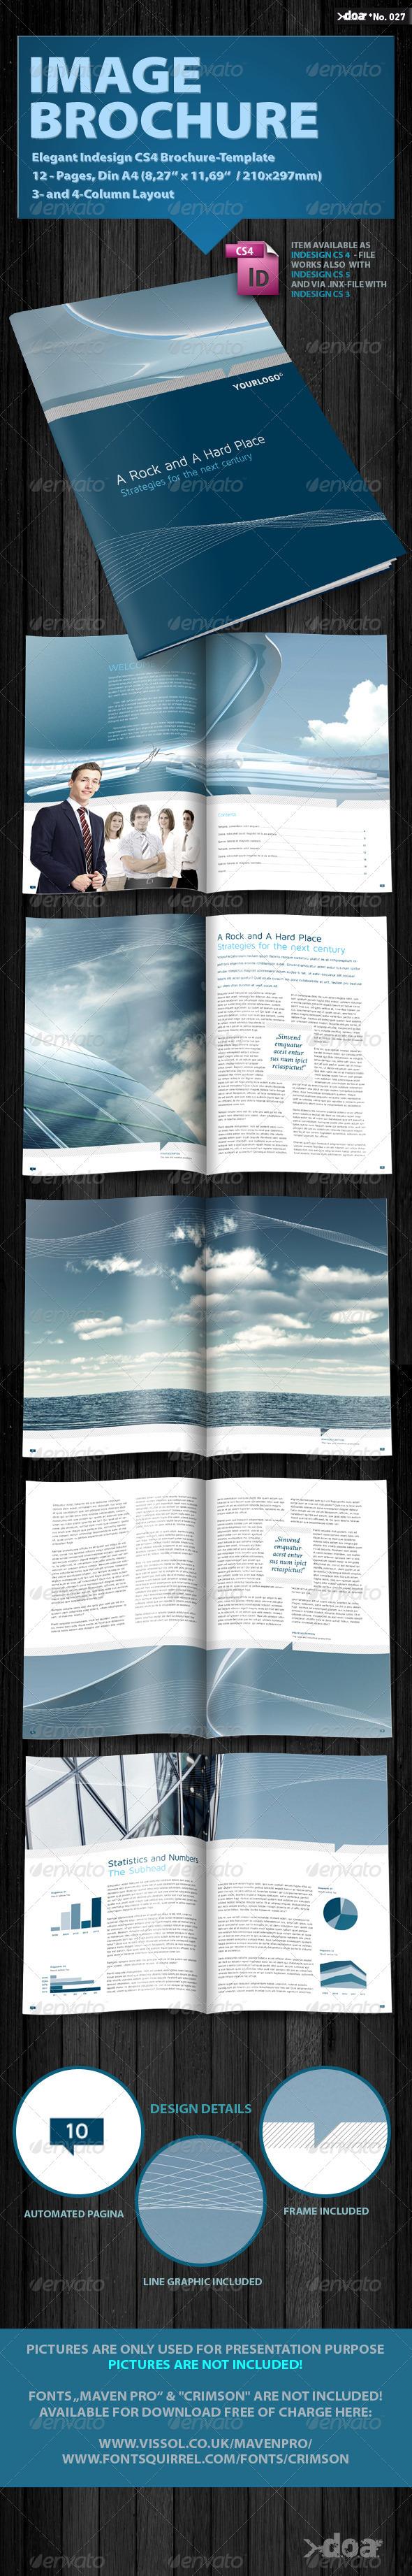 Graphic River Elegant Image Brochure Print Templates -  Brochures  Corporate 506117